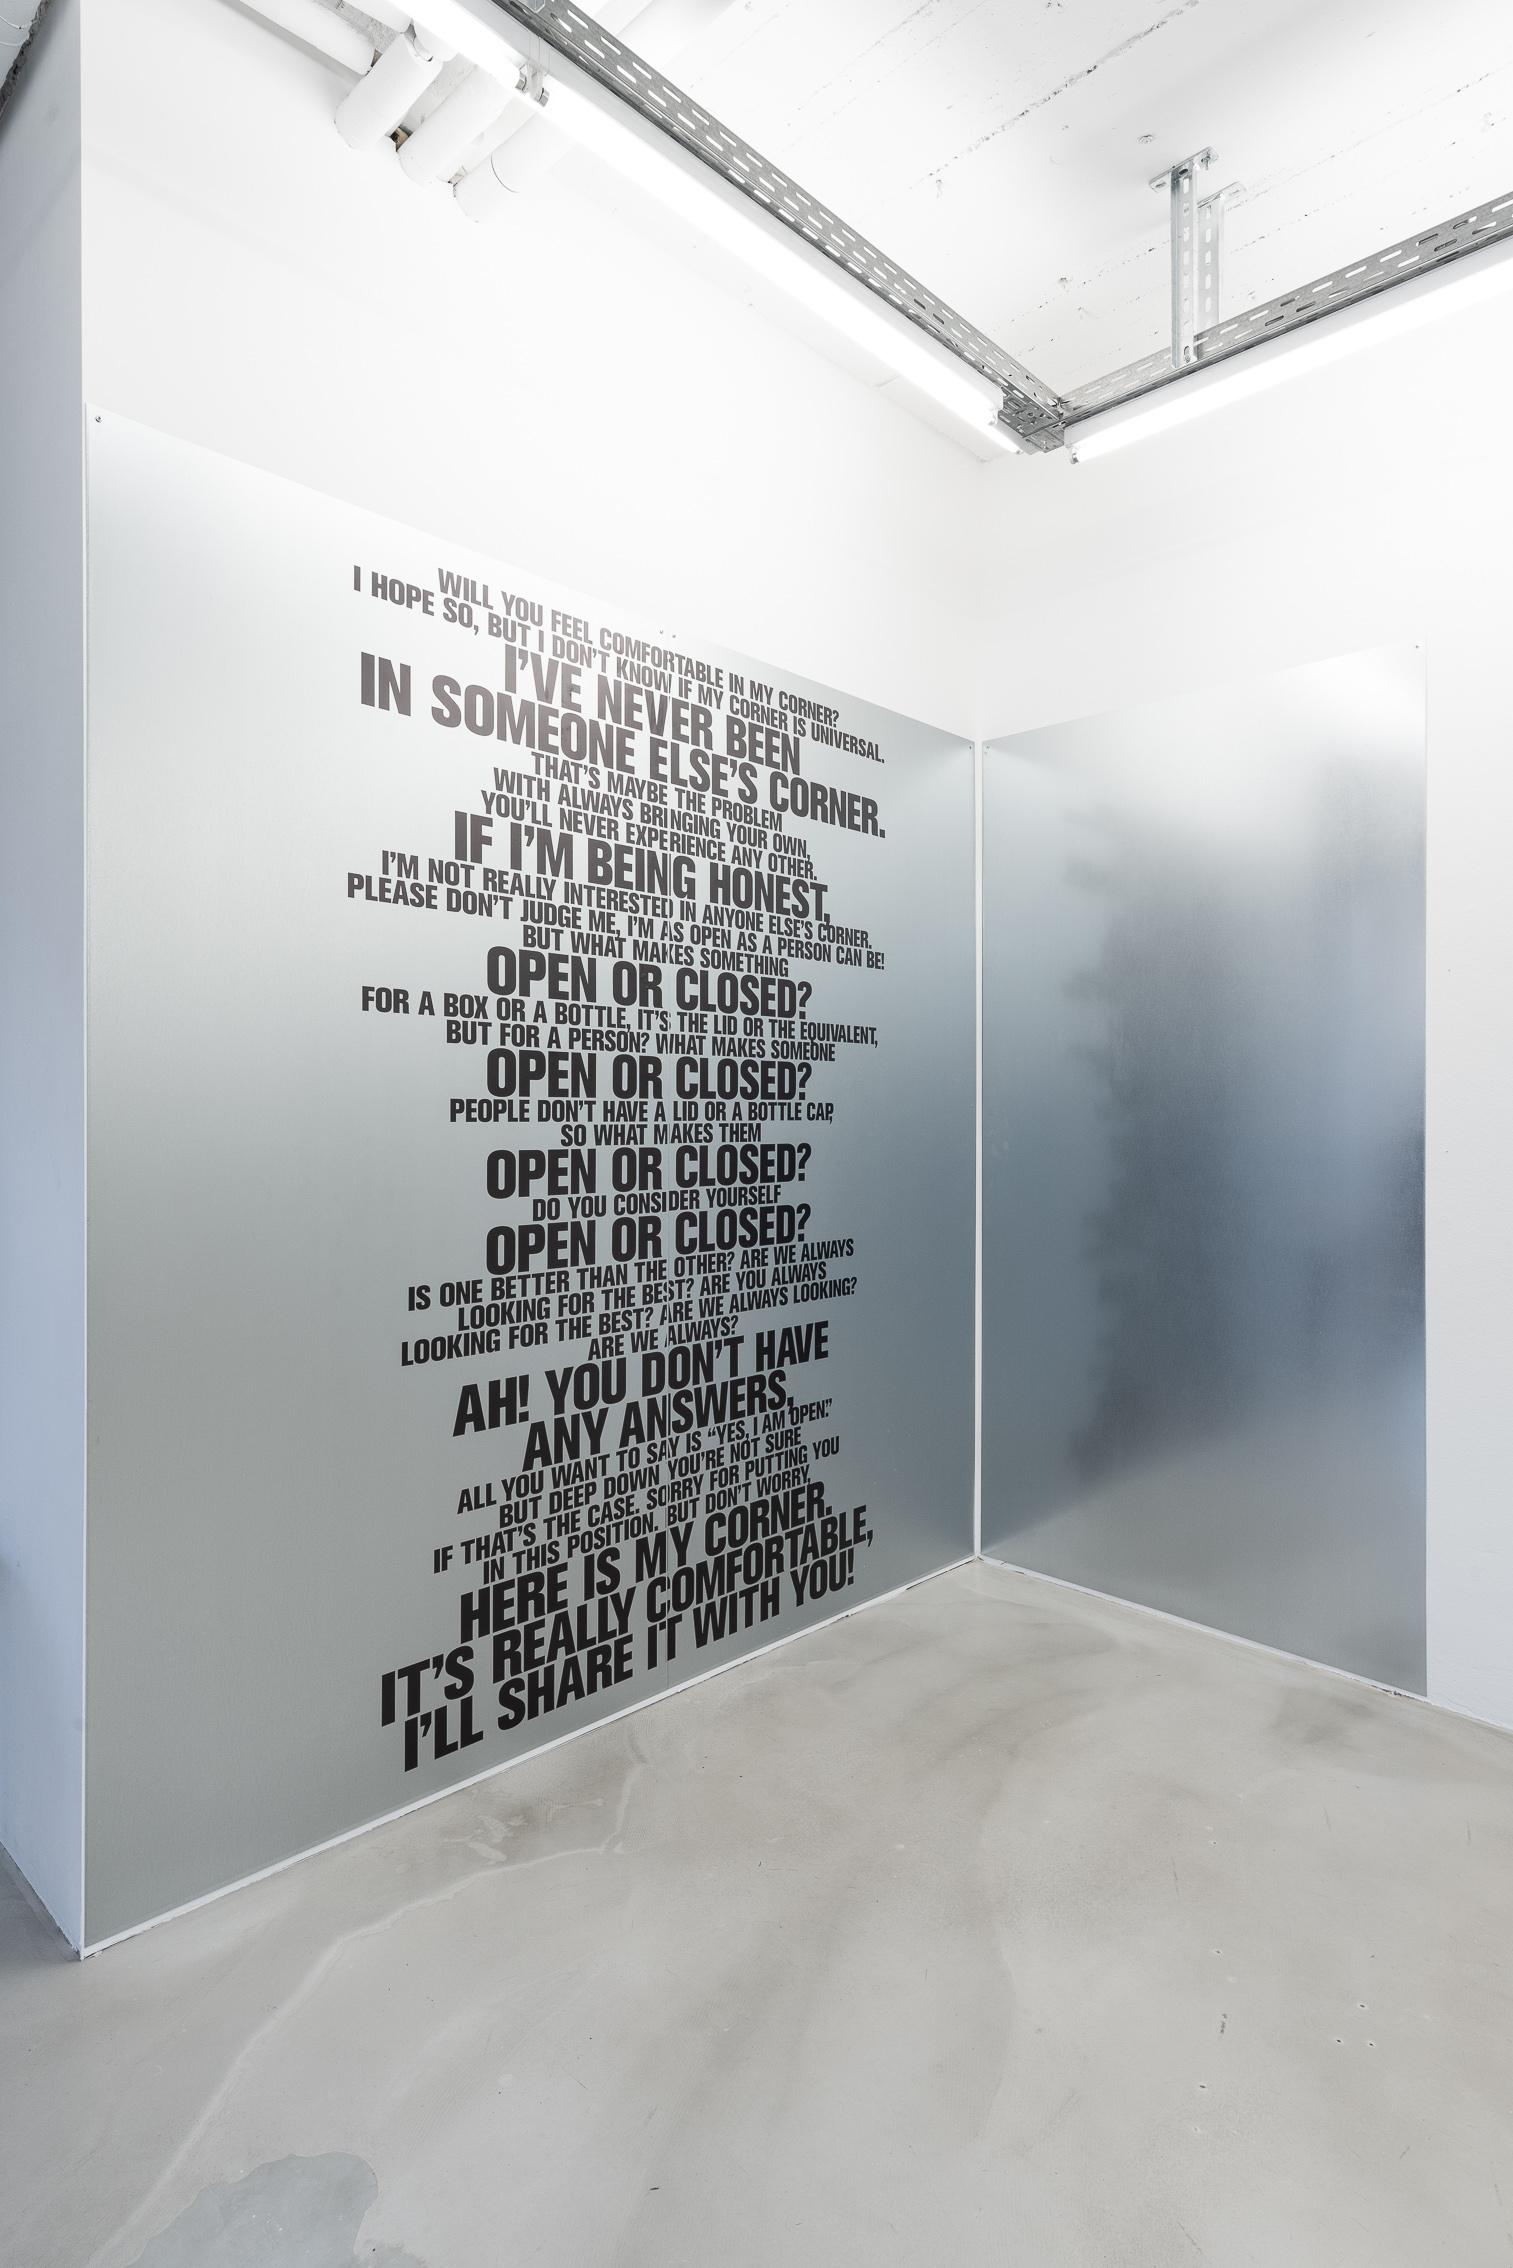 Ndayé Kouagou, Are you always?, 2020. Εκτυπωμένο βινύλιο, μεταλλικές πλάκες, 250 x 250 εκ. Παραχώρηση του καλλιτέχνη και της γκαλερί Nir Altman, Μόναχο